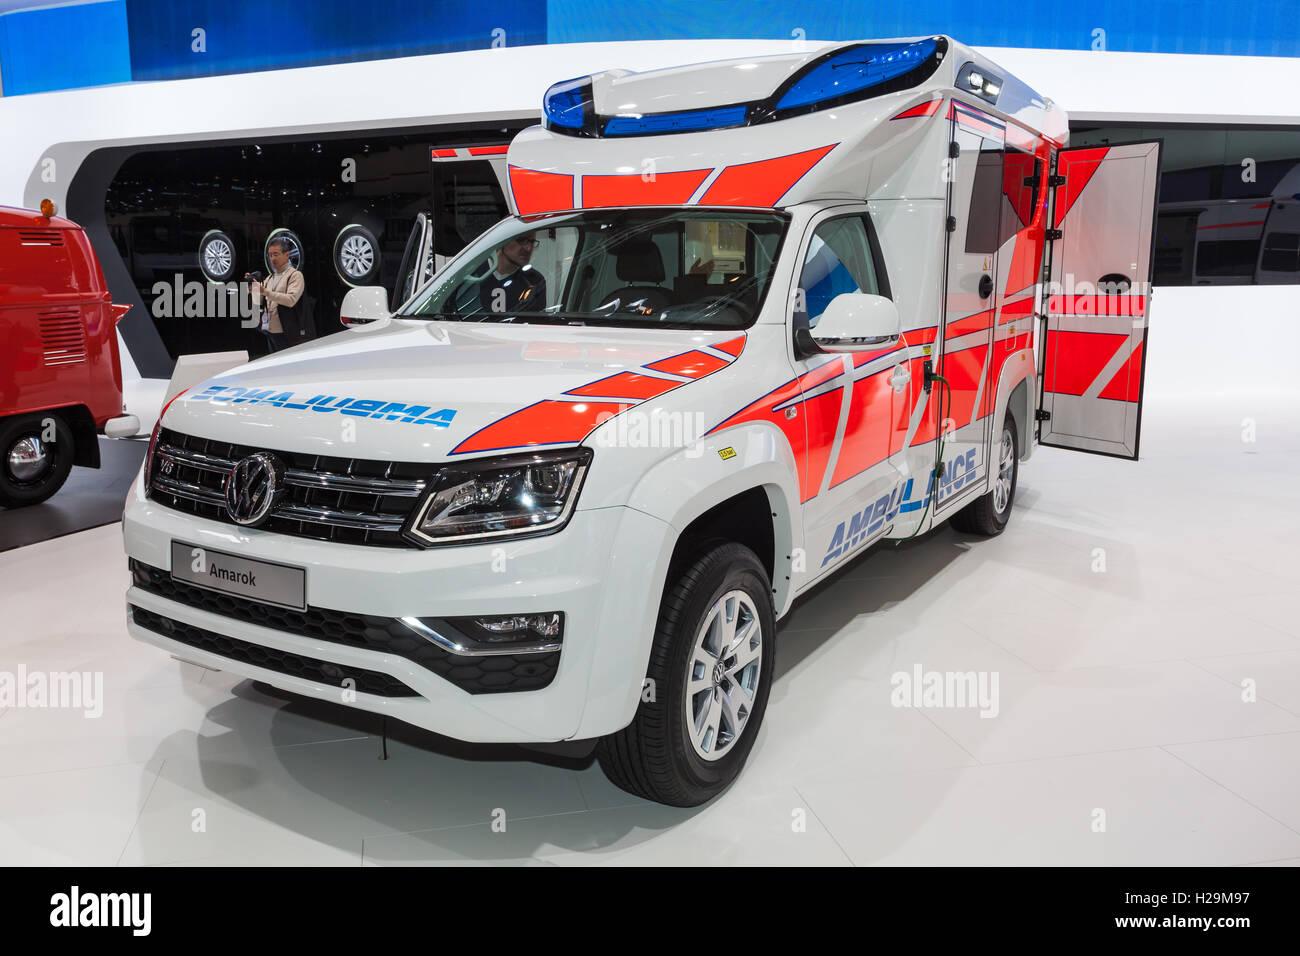 new volkswagen amarok ambulance car stock photo royalty free image 121915395 alamy. Black Bedroom Furniture Sets. Home Design Ideas